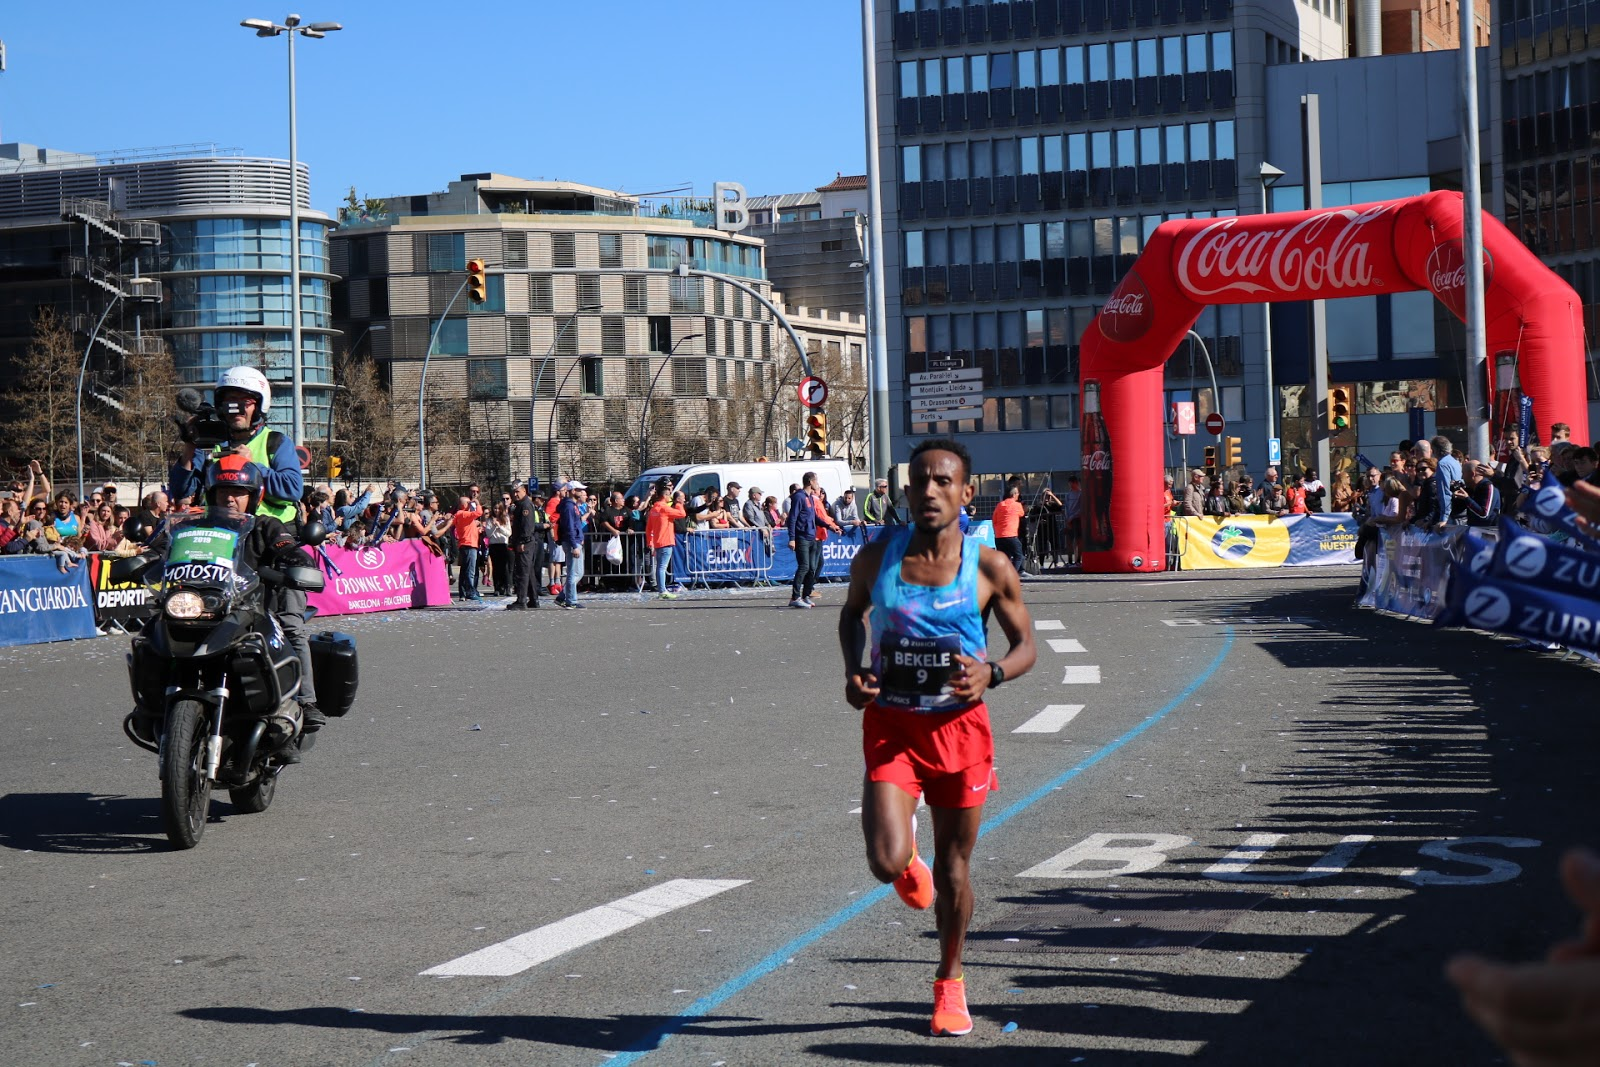 Dos Récords en la Zúrich Marató de Barcelona 2019